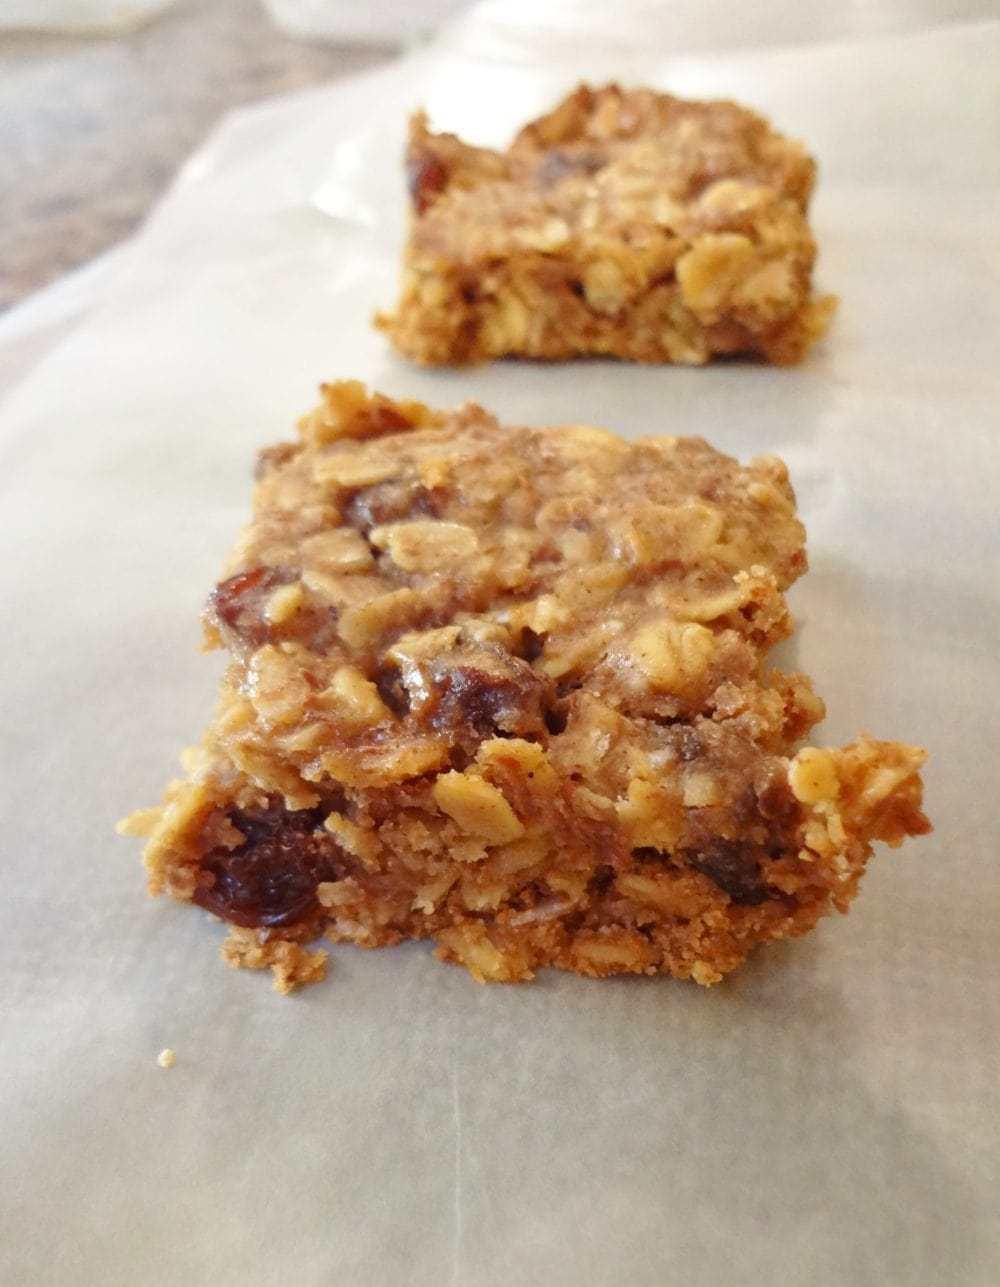 Whole Grain Muesli Bars • The Fit Cookie